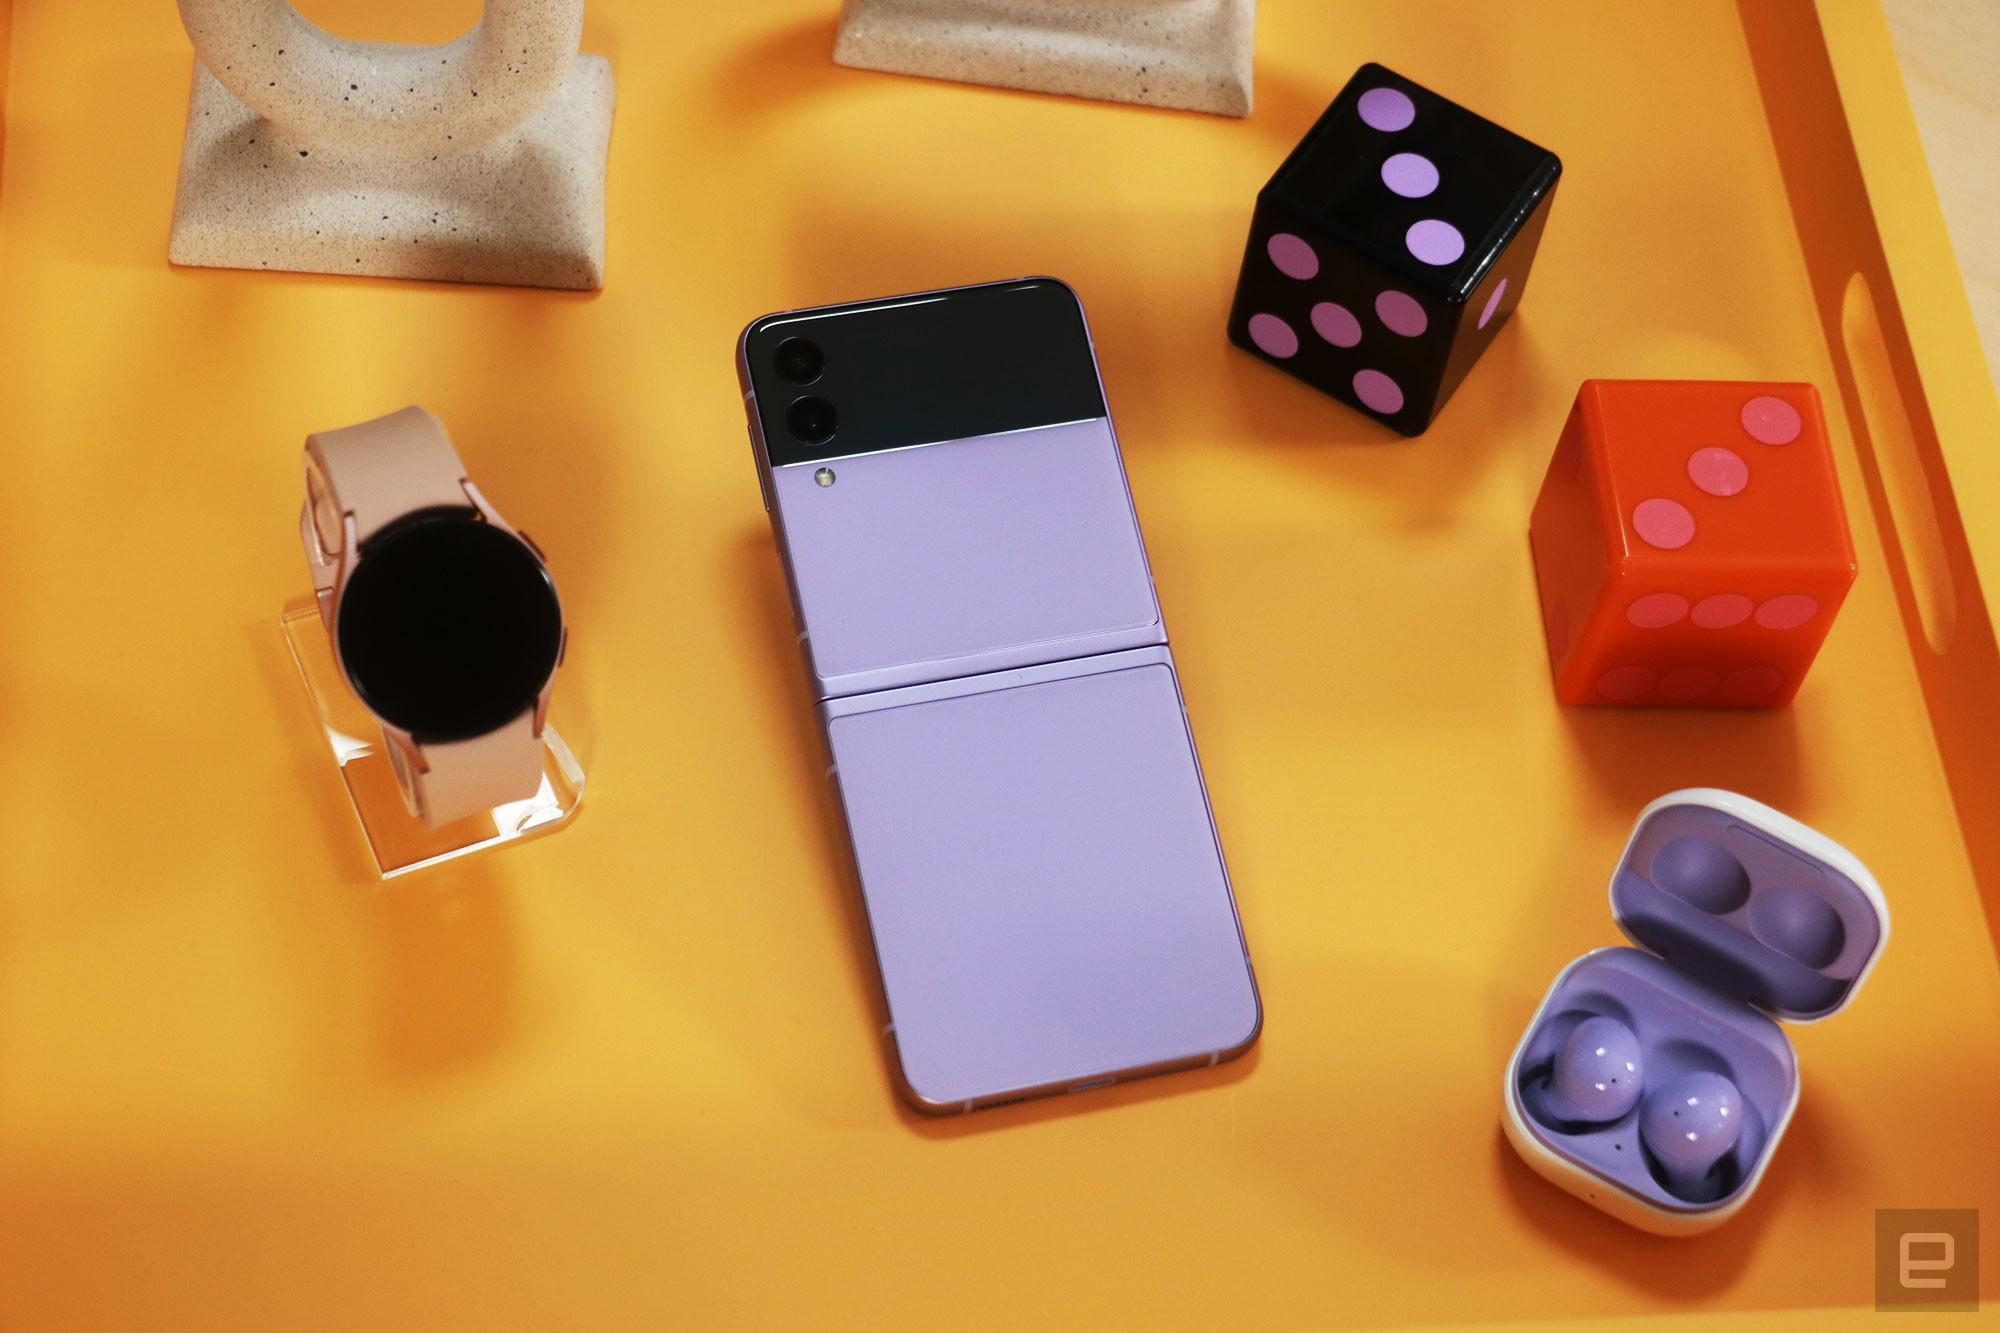 Galaxy Z Flip 3 hands-on: A straightforward upgrade for a nice price cut